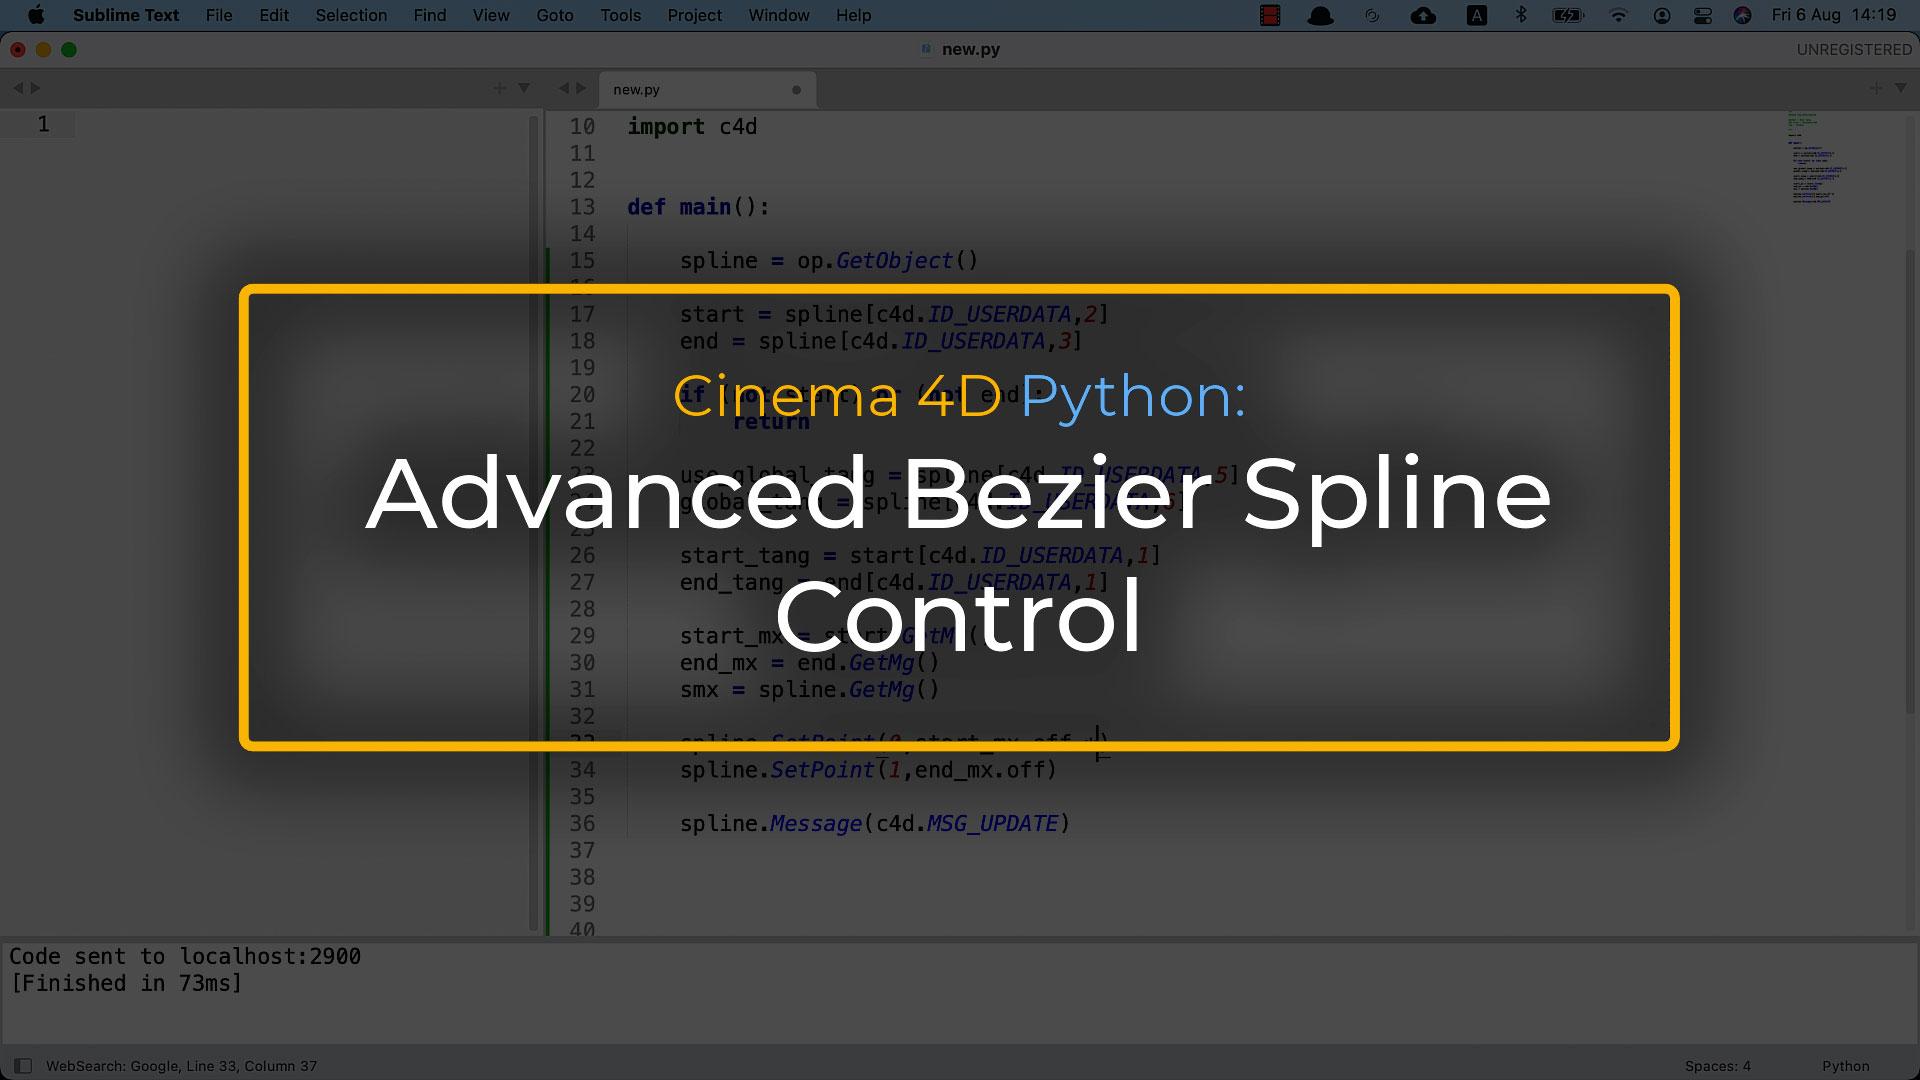 Control in Cinema 4D Besier Spline With Python Tag